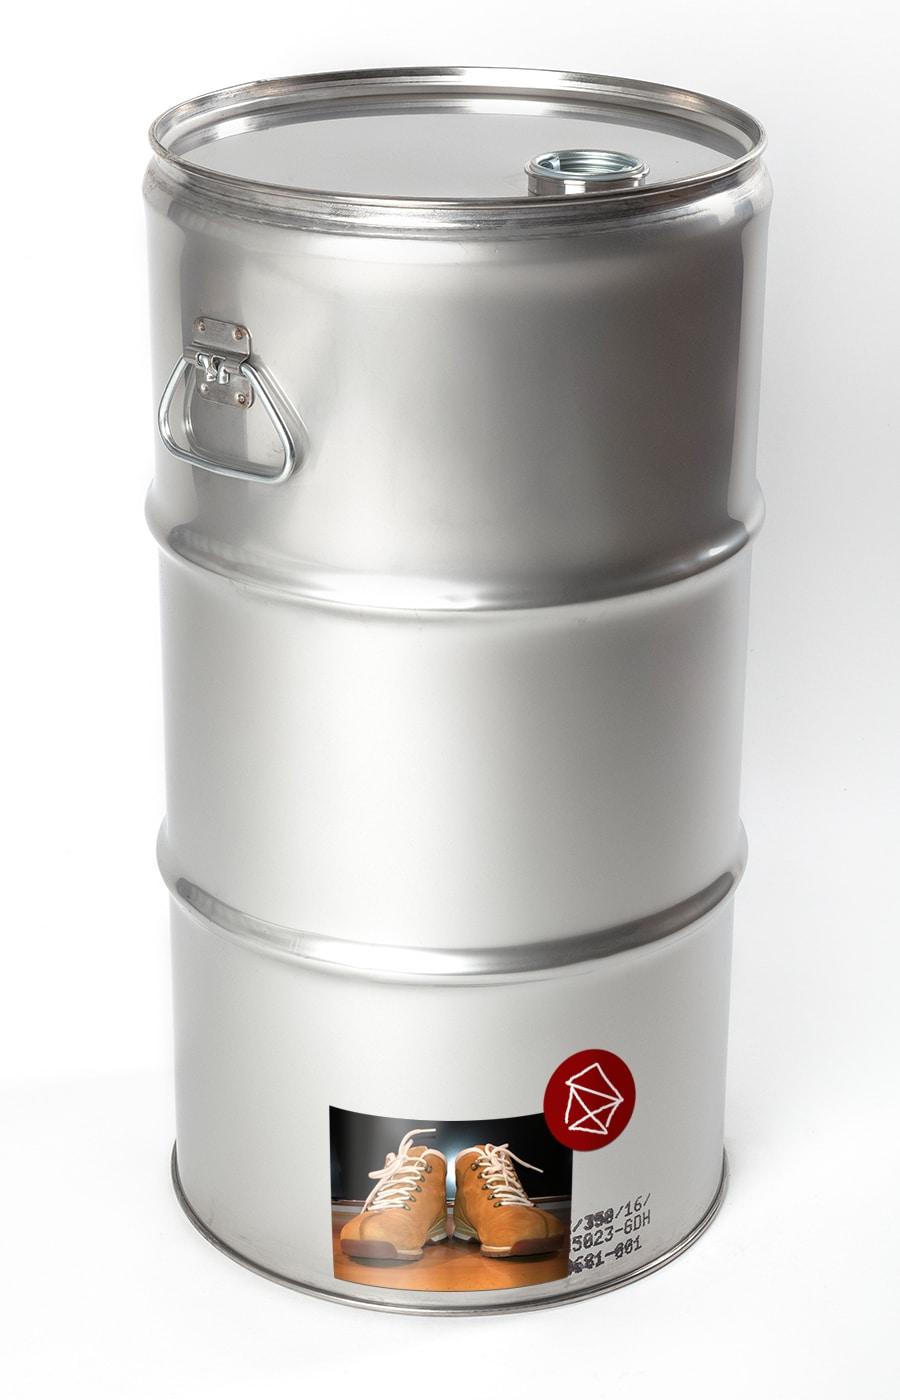 WEDTHOFF Großhandel Industrieverpackungen Gefahrgutverpackung Spundfass / Edelstahl Fass 200 l